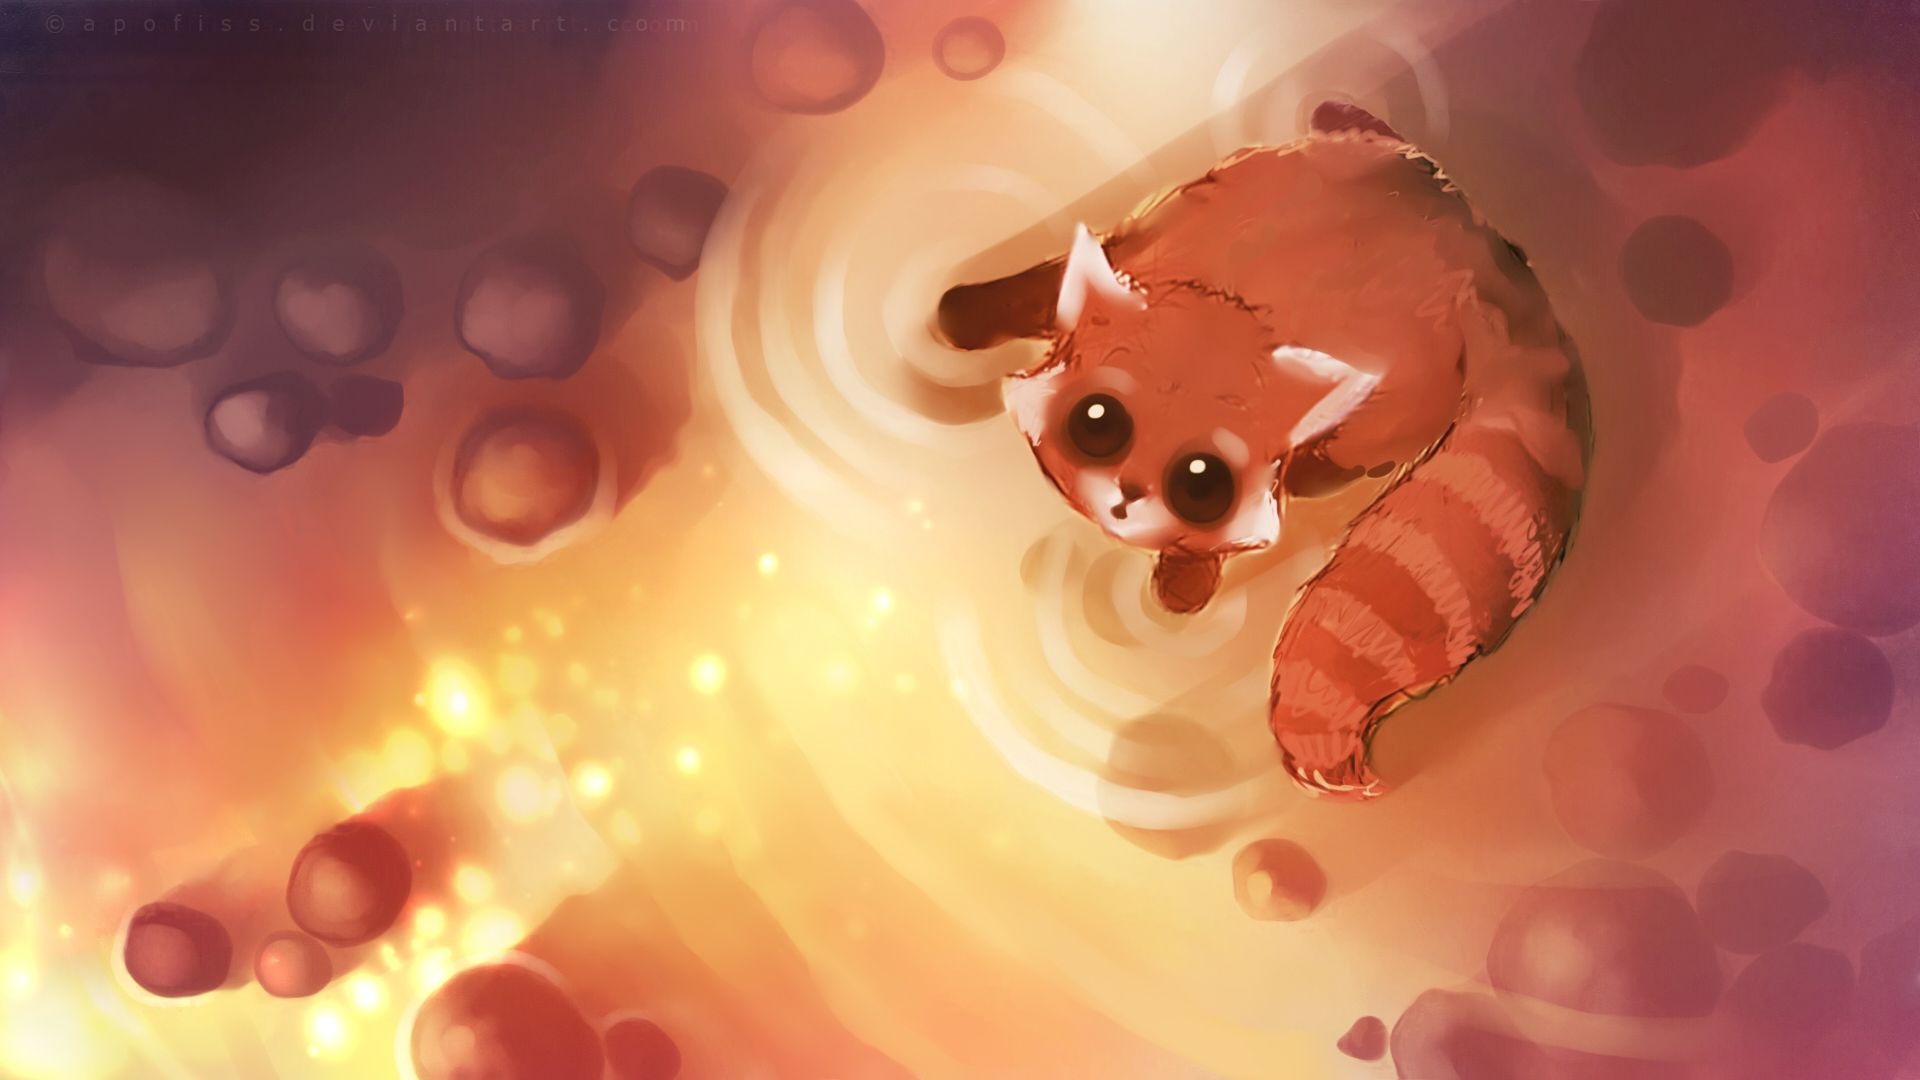 Download Cute Fox Cartoon Wallpaper 1920x1080 HD